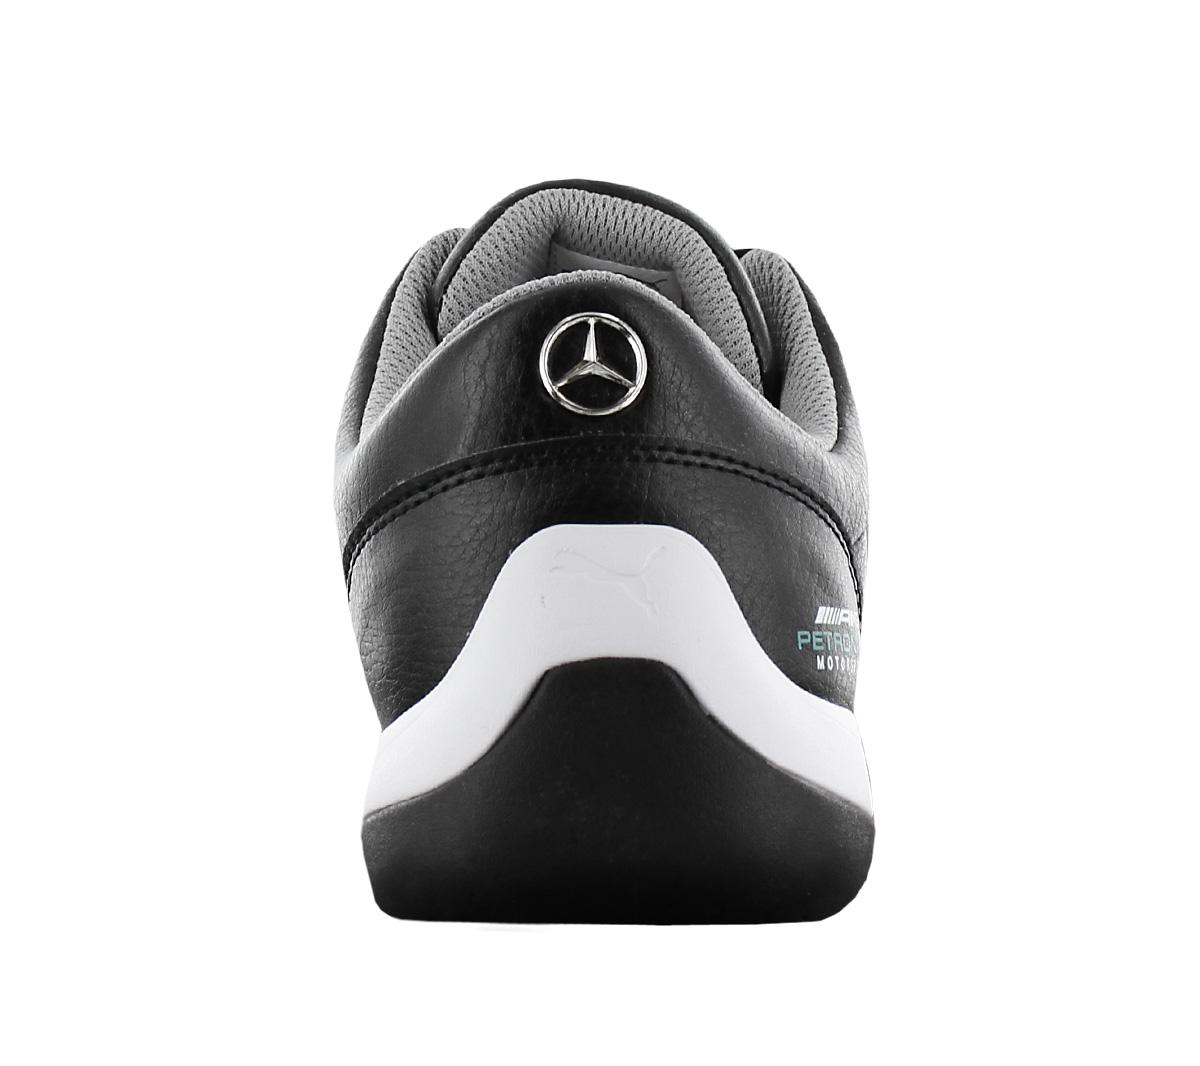 Details about Puma Mercedes AMG Petronas Kart Cat III Men s Shoes Sneakers  306244-02 New ff5e587d5